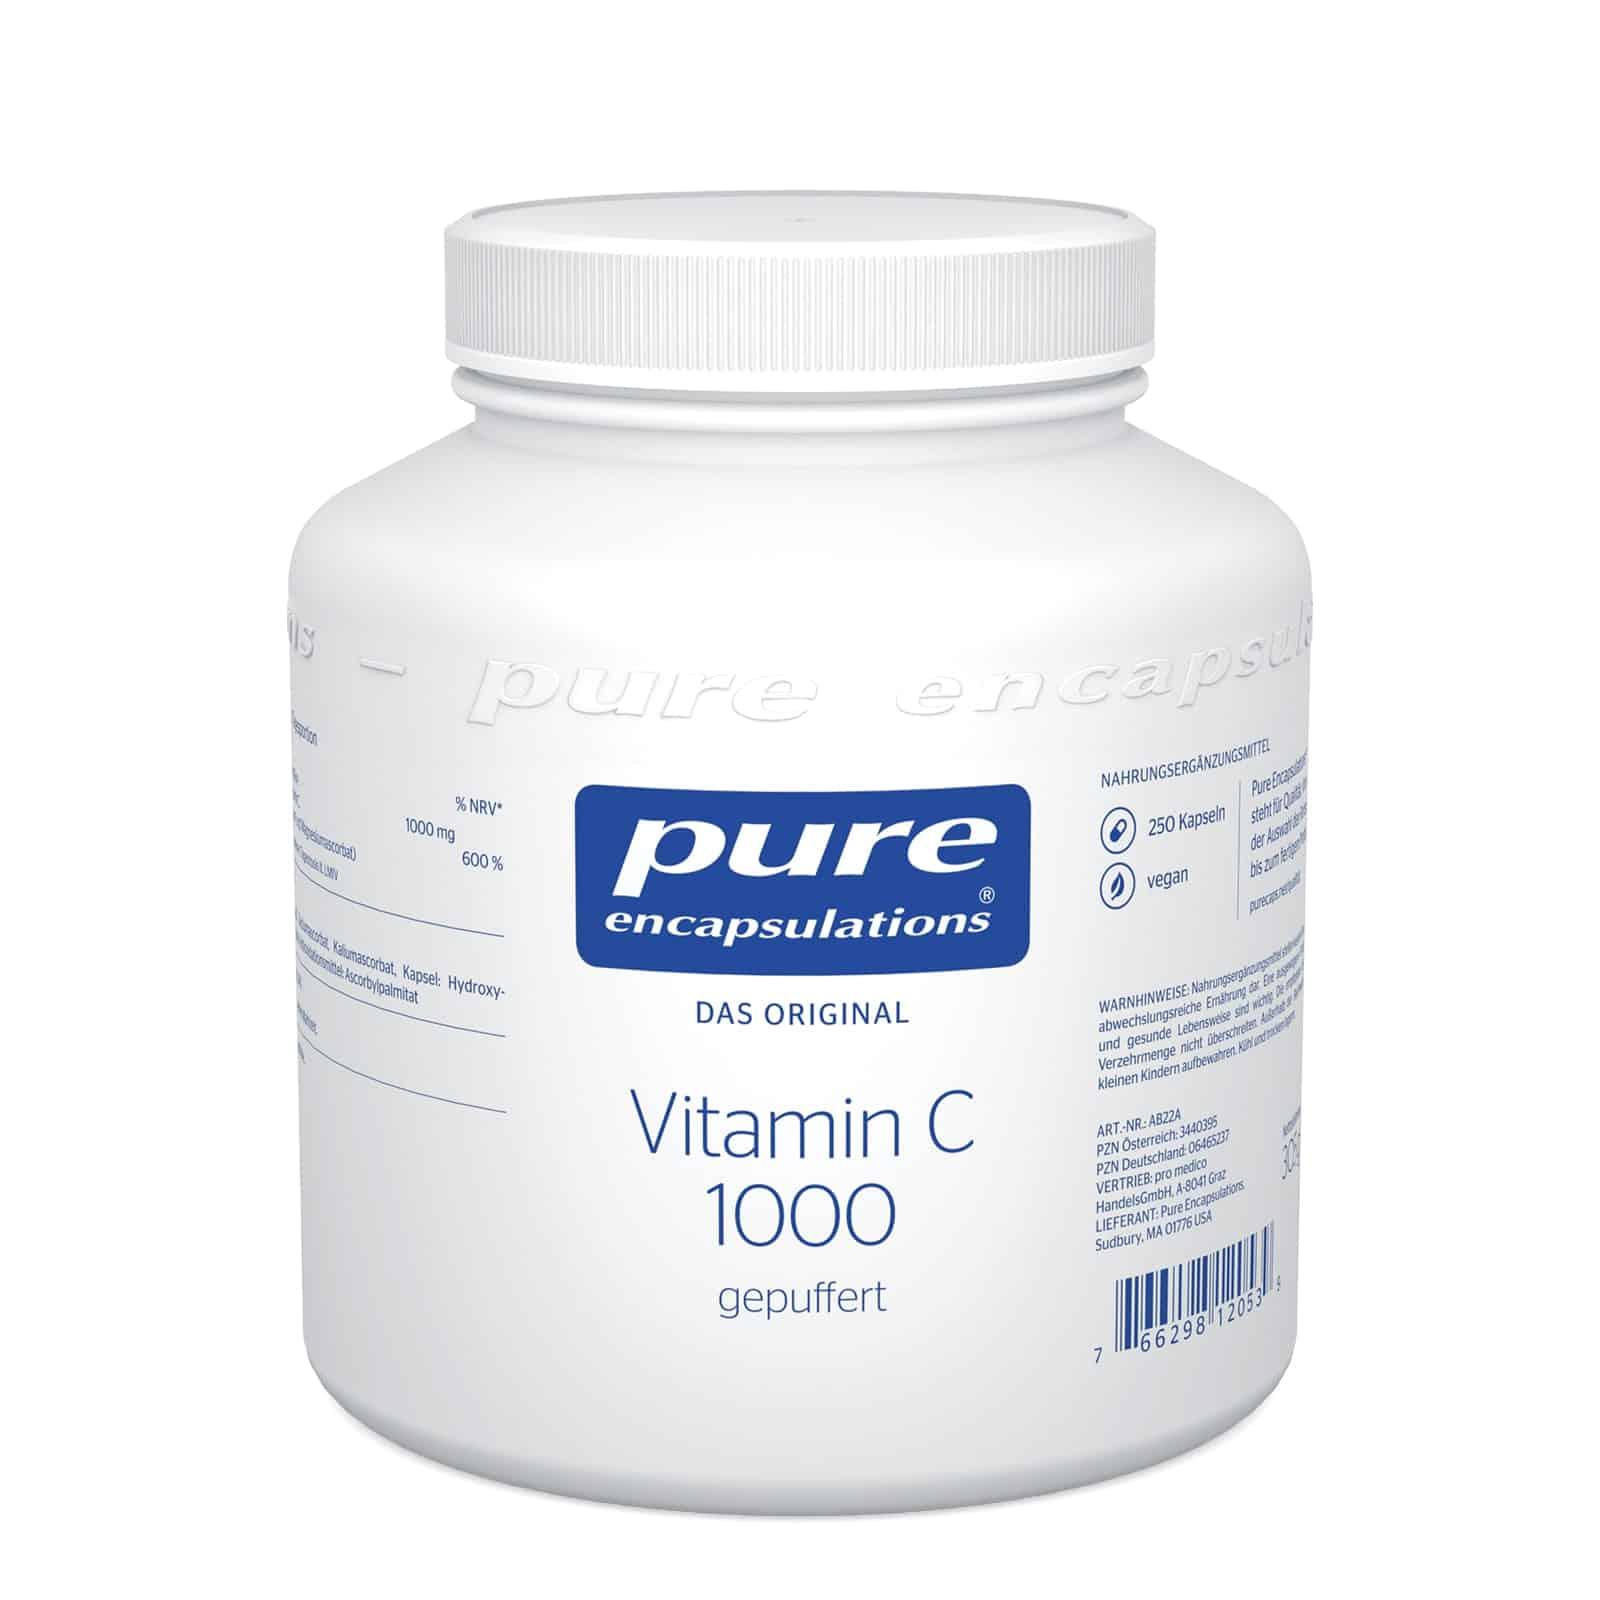 Pure Encapsulations Vitamin C 1000 gepuffert Kapseln